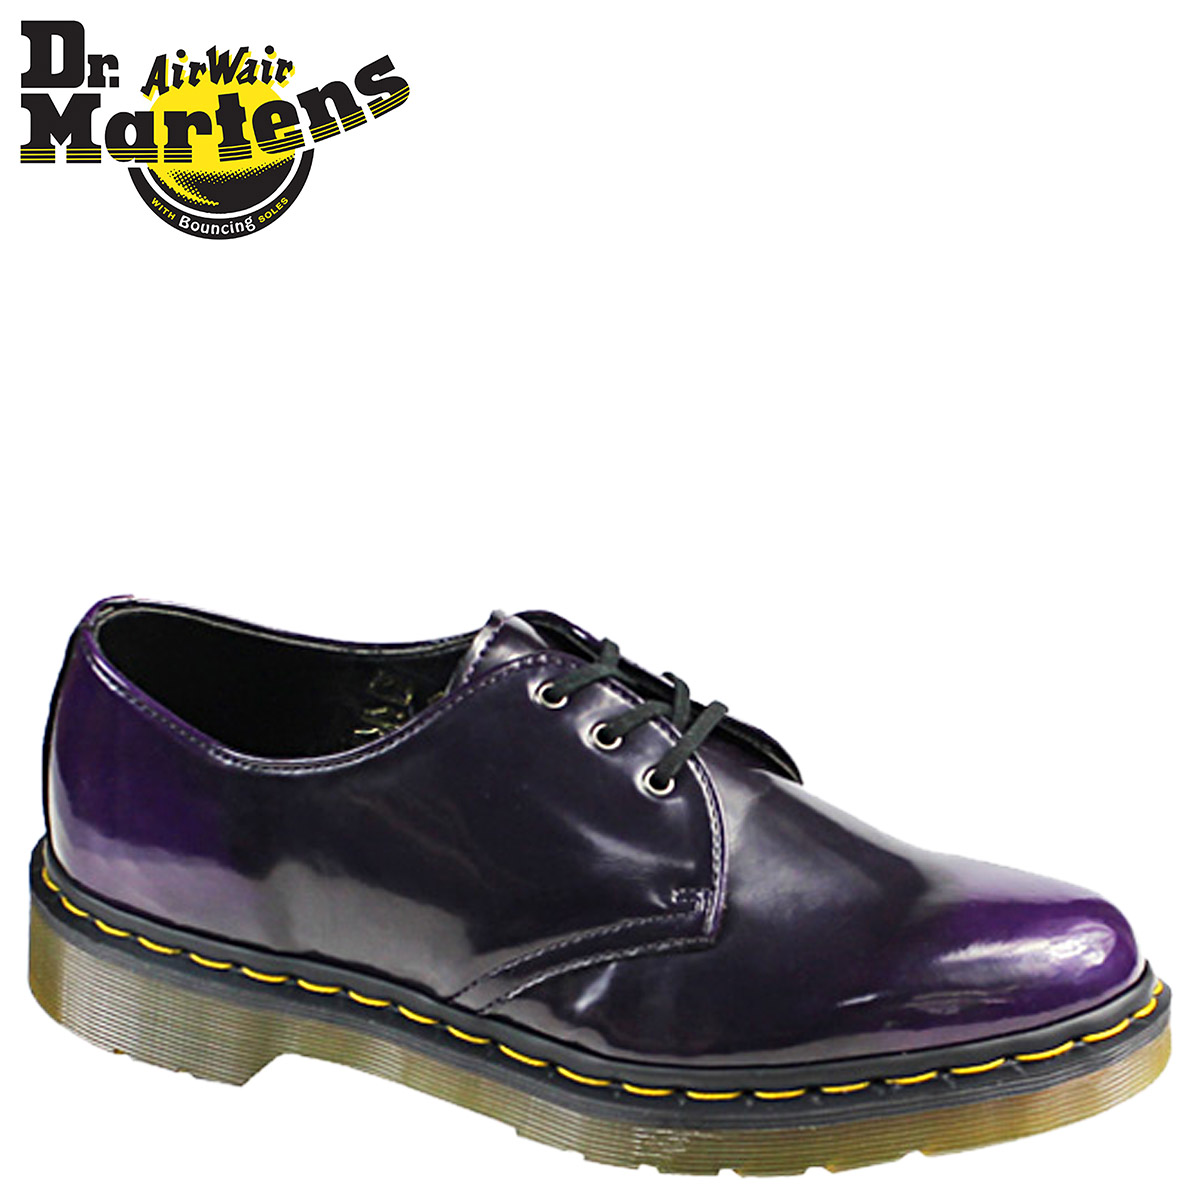 Synthetic leather men's shoes Dr. Martens Dr.Martens 3 Hall [purple] R14046510 VEGAN 1461 [regular] fs04gm